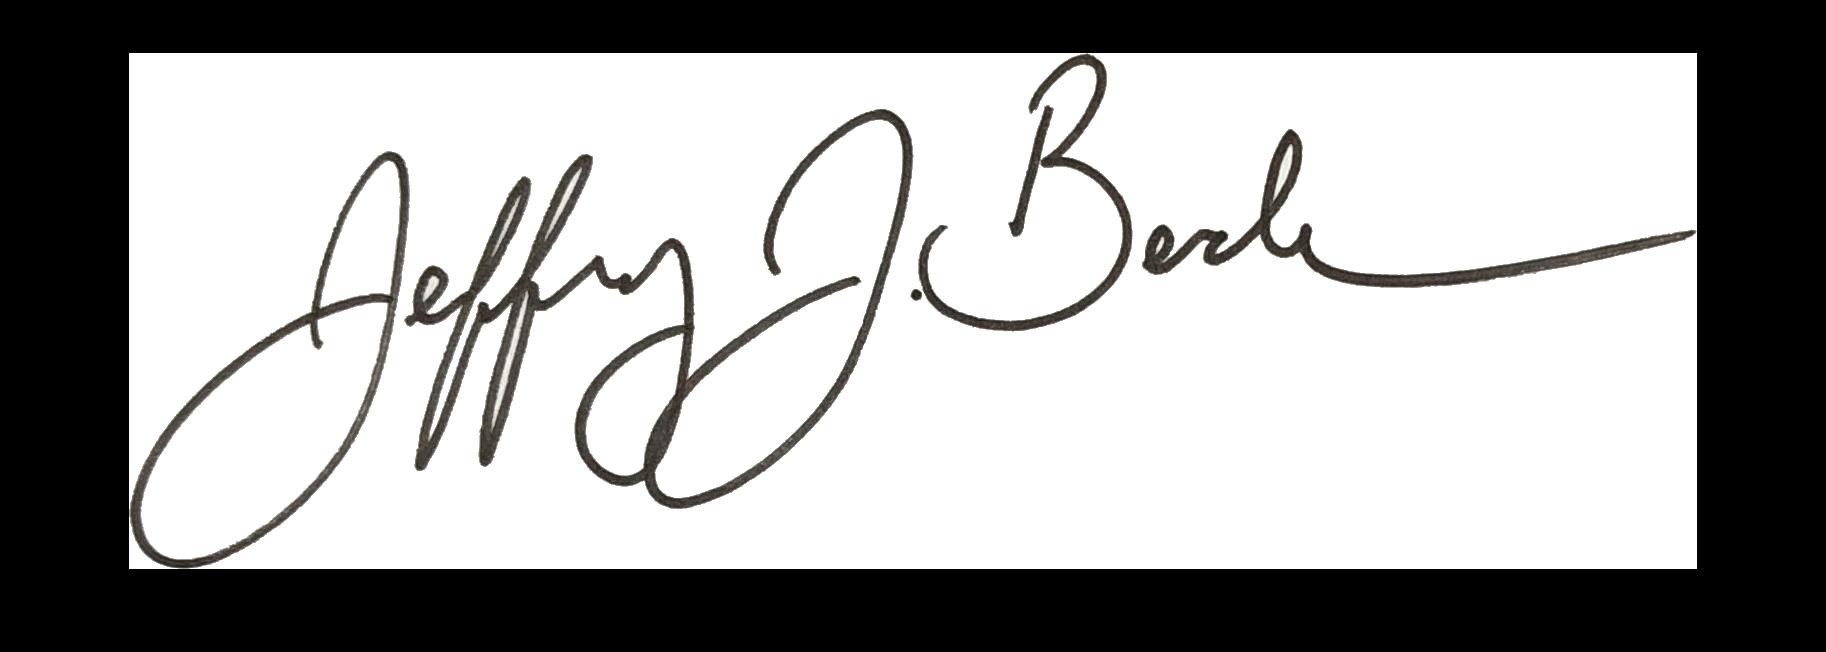 Jeff Beck, Director of Admission